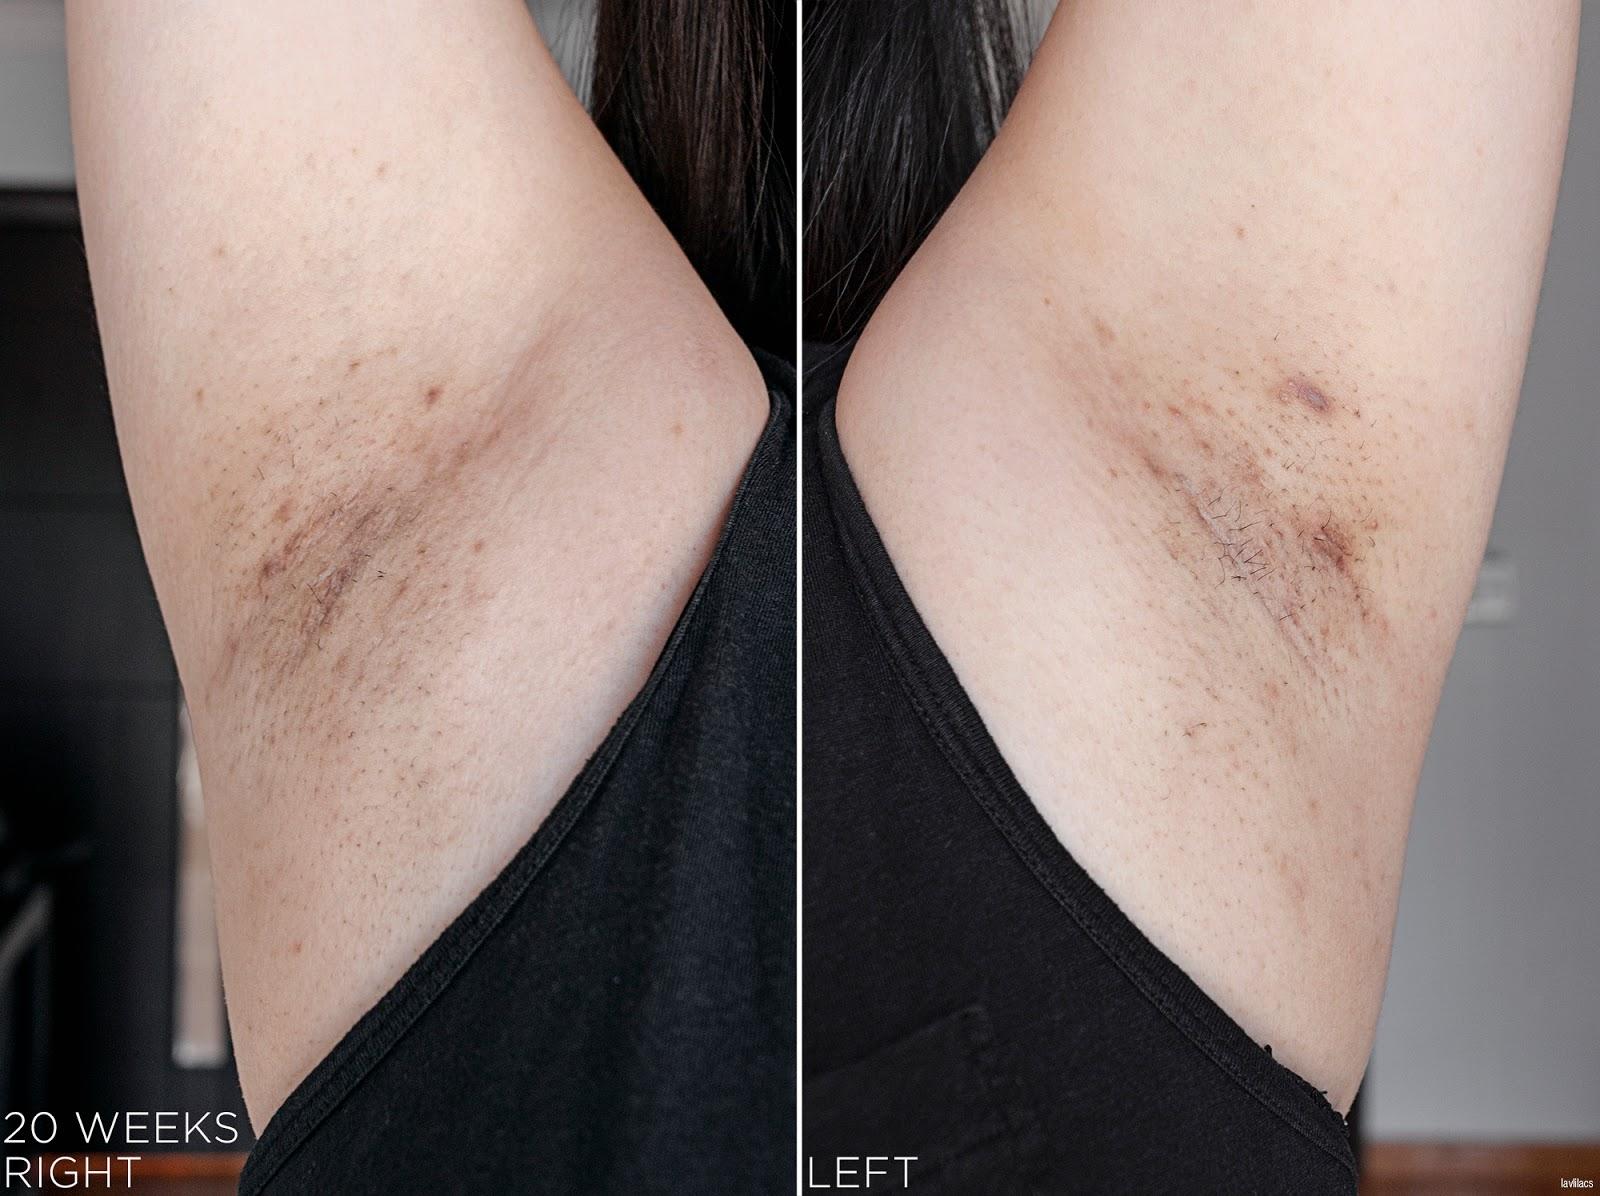 tria Hair Removal Laser Armpits Hair 20 Weeks